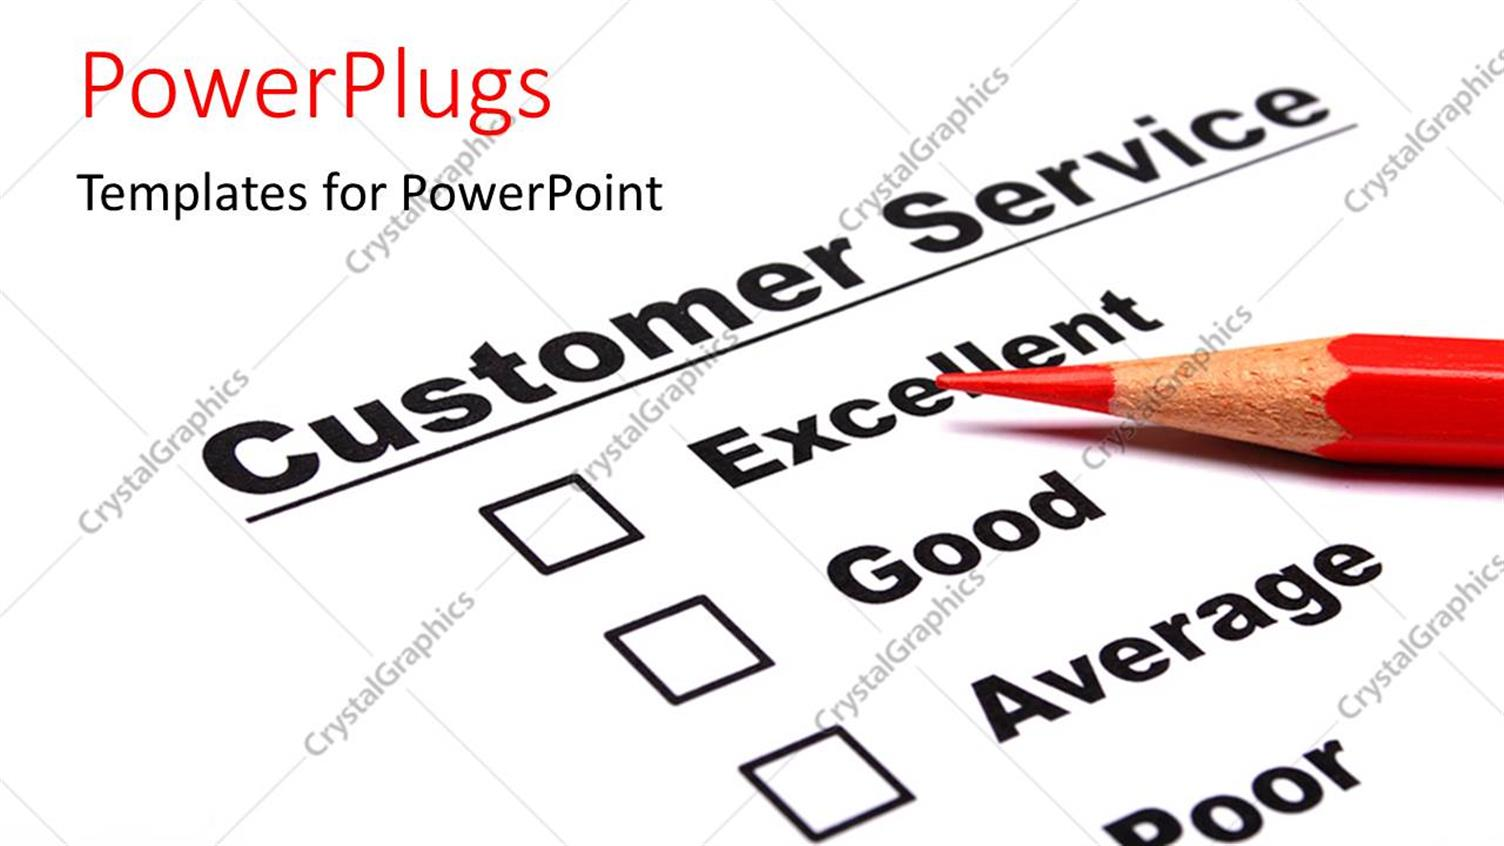 Best powerpoint survey template ideas entry level resume templates powerpoint template a color pencil and a customer service document toneelgroepblik Gallery